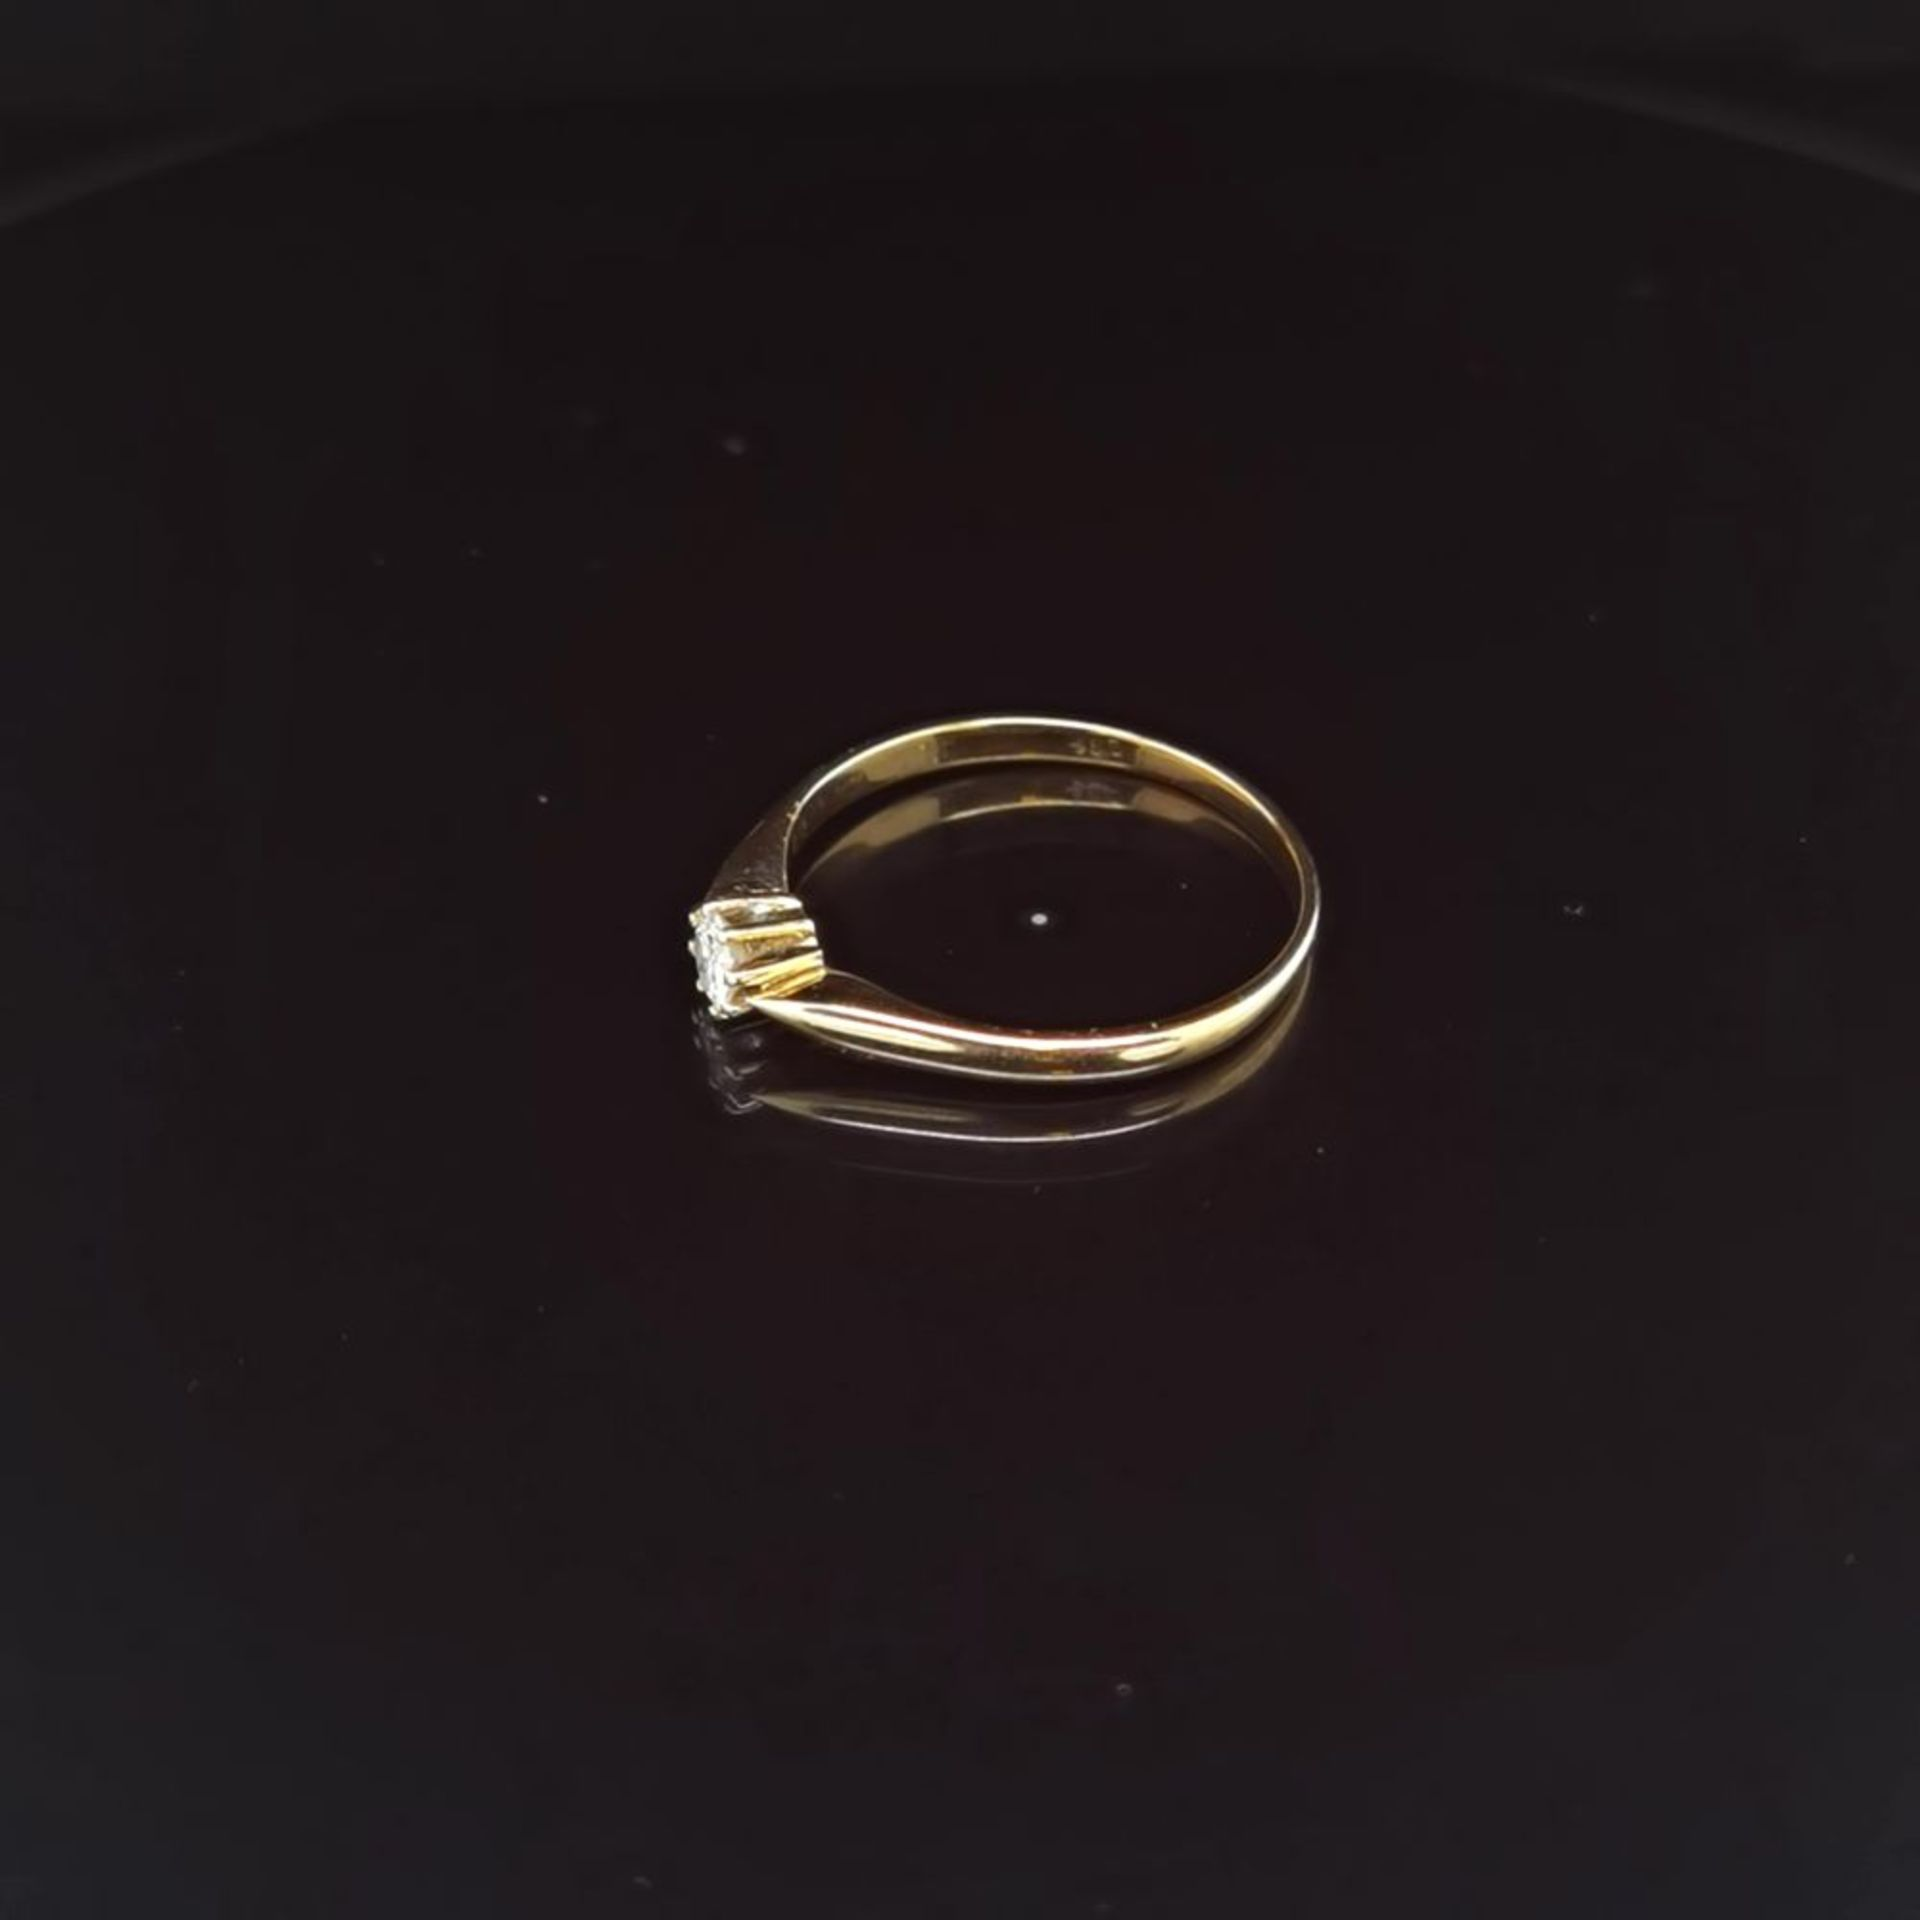 Brillant-Ring, 585 Gelbgold 2,3 - Image 2 of 3